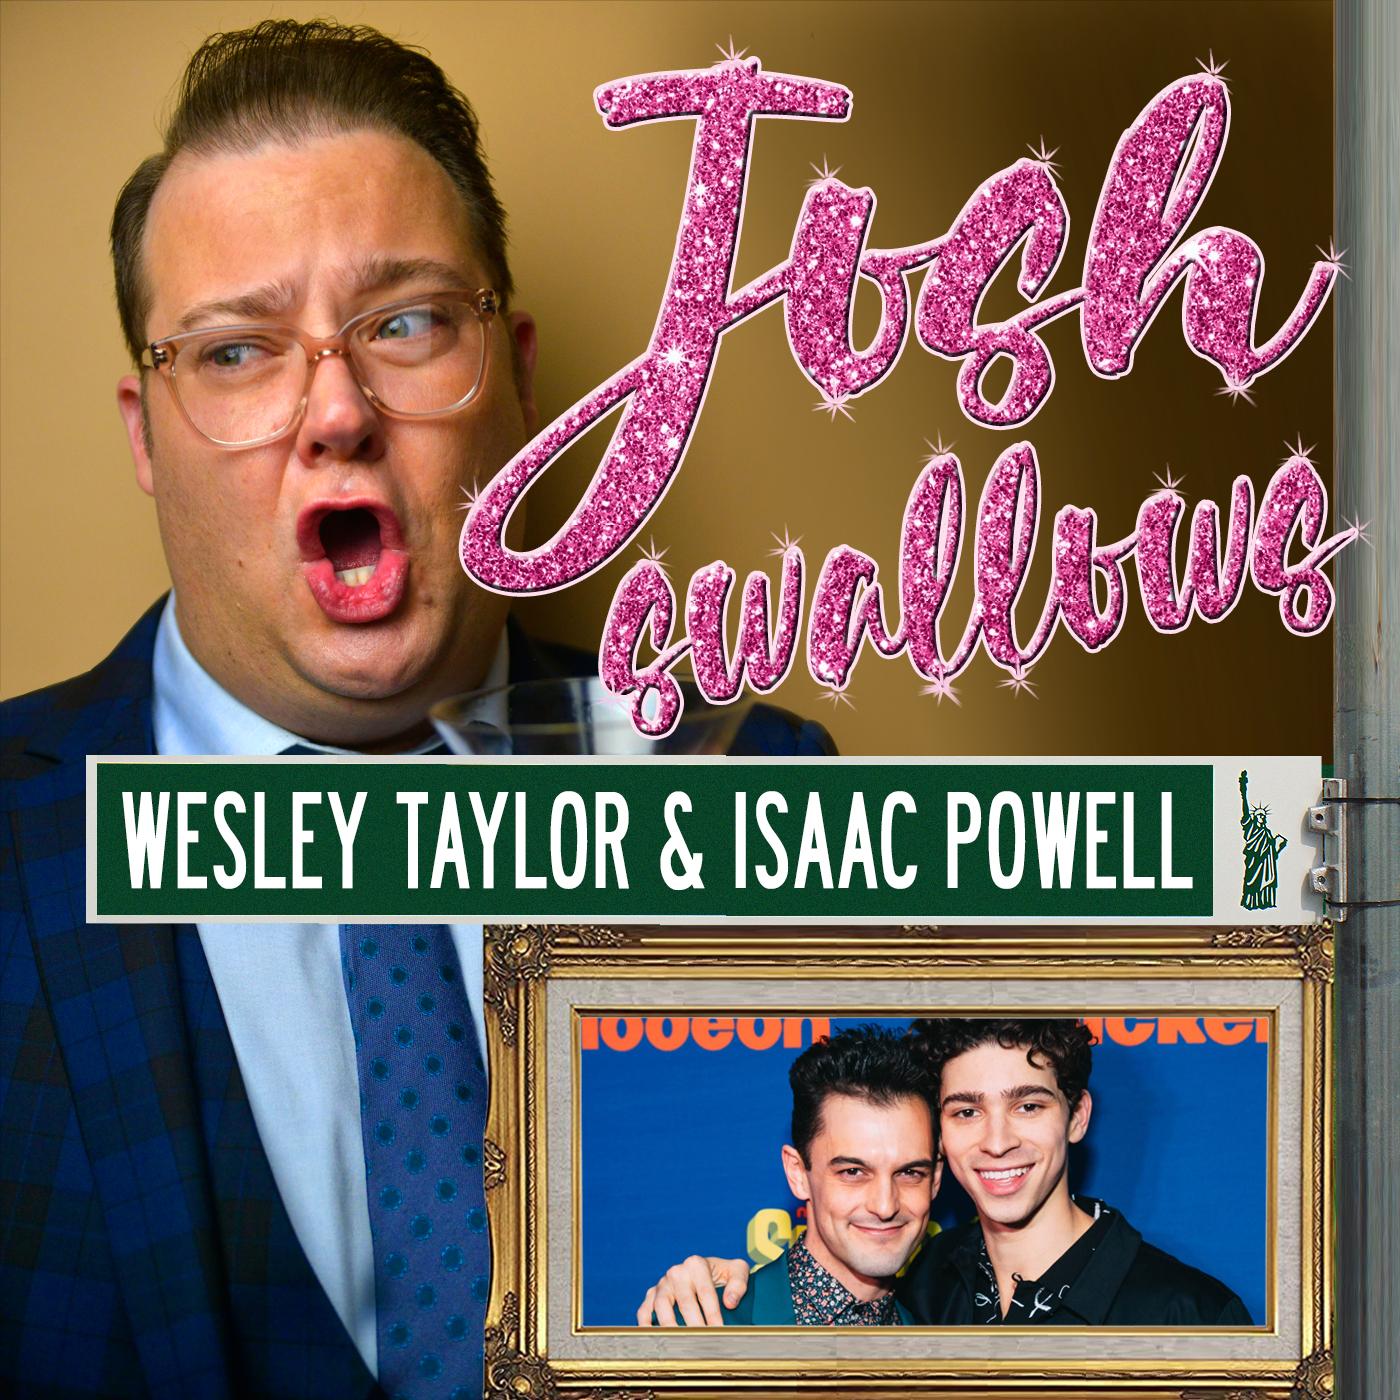 Ep30 - Wesley Taylor & Isaac Powell: Broadway's Darlings